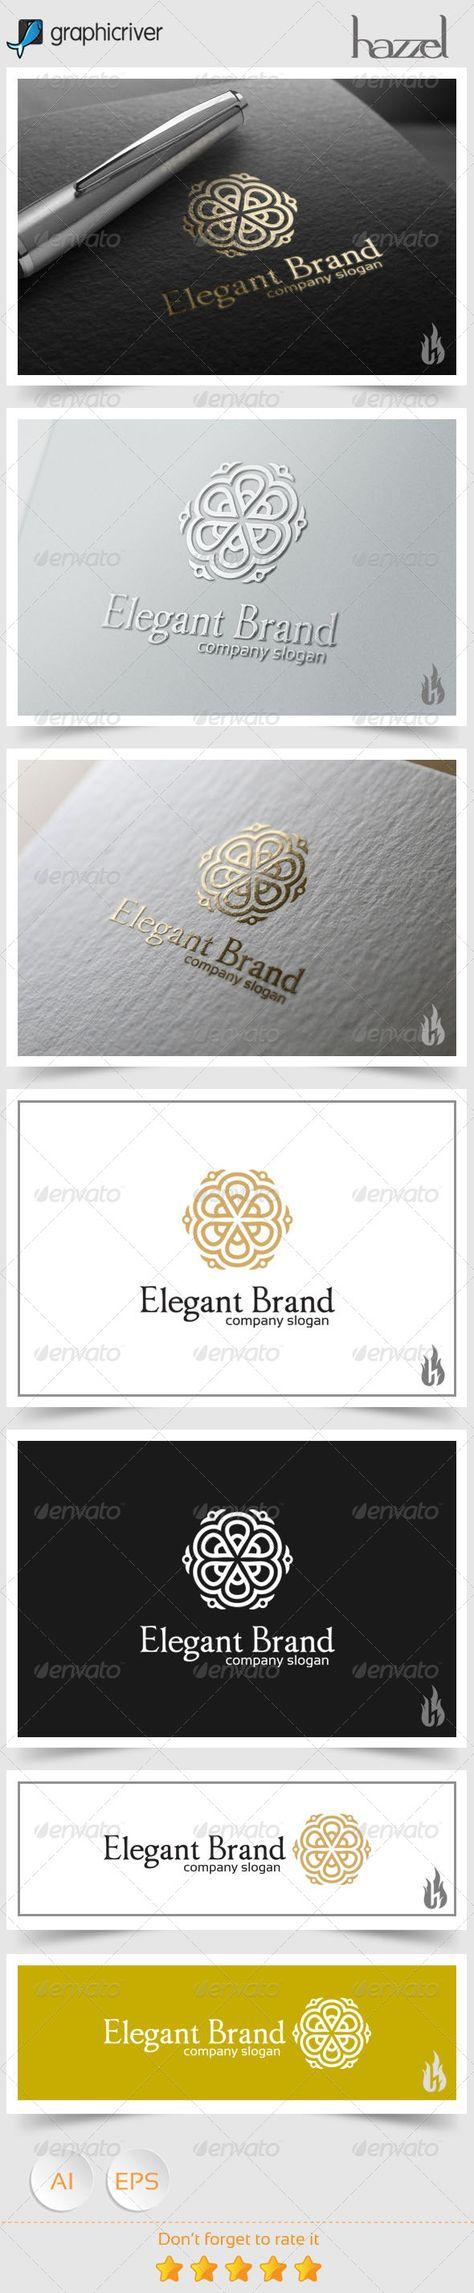 362 best logo images on pinterest geometry 362 best logo images on pinterest geometry advertising and cards magicingreecefo Images